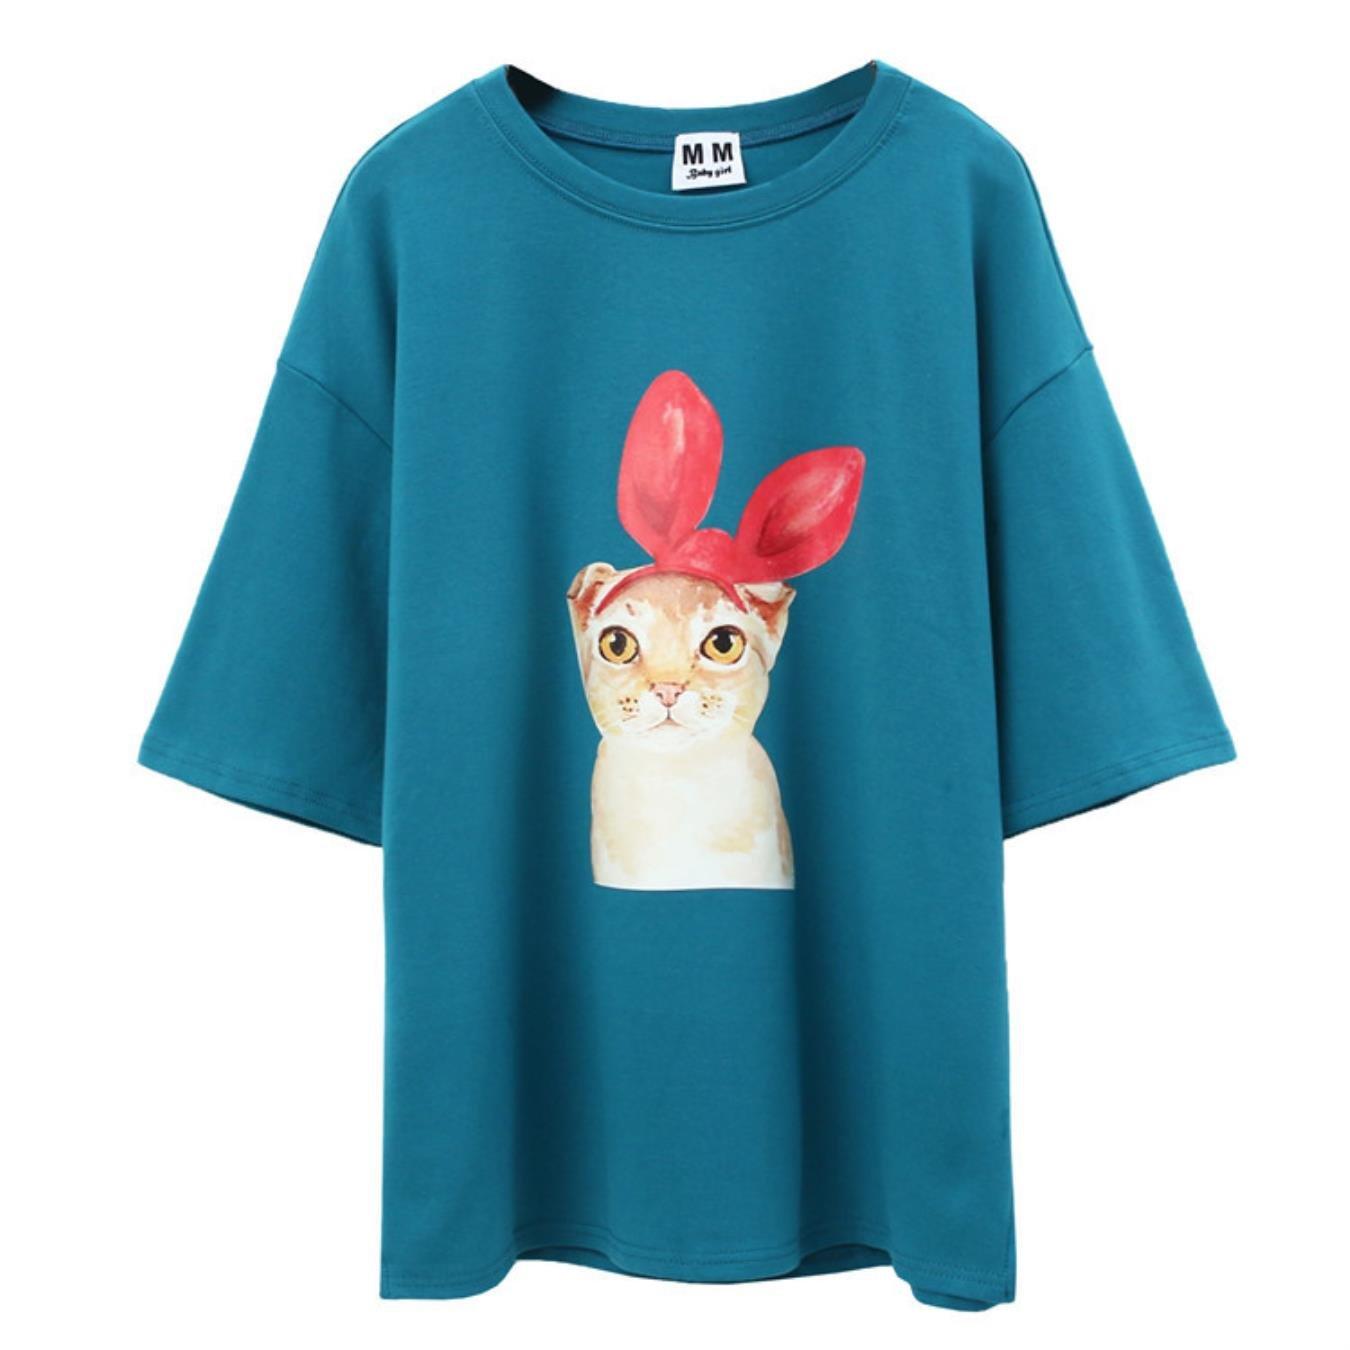 New Women Cartoon Bow Cat Printed T Shirt Sweet Girl Short Sleeve O-Neck Summer Cotton Casual Loose Top Tees